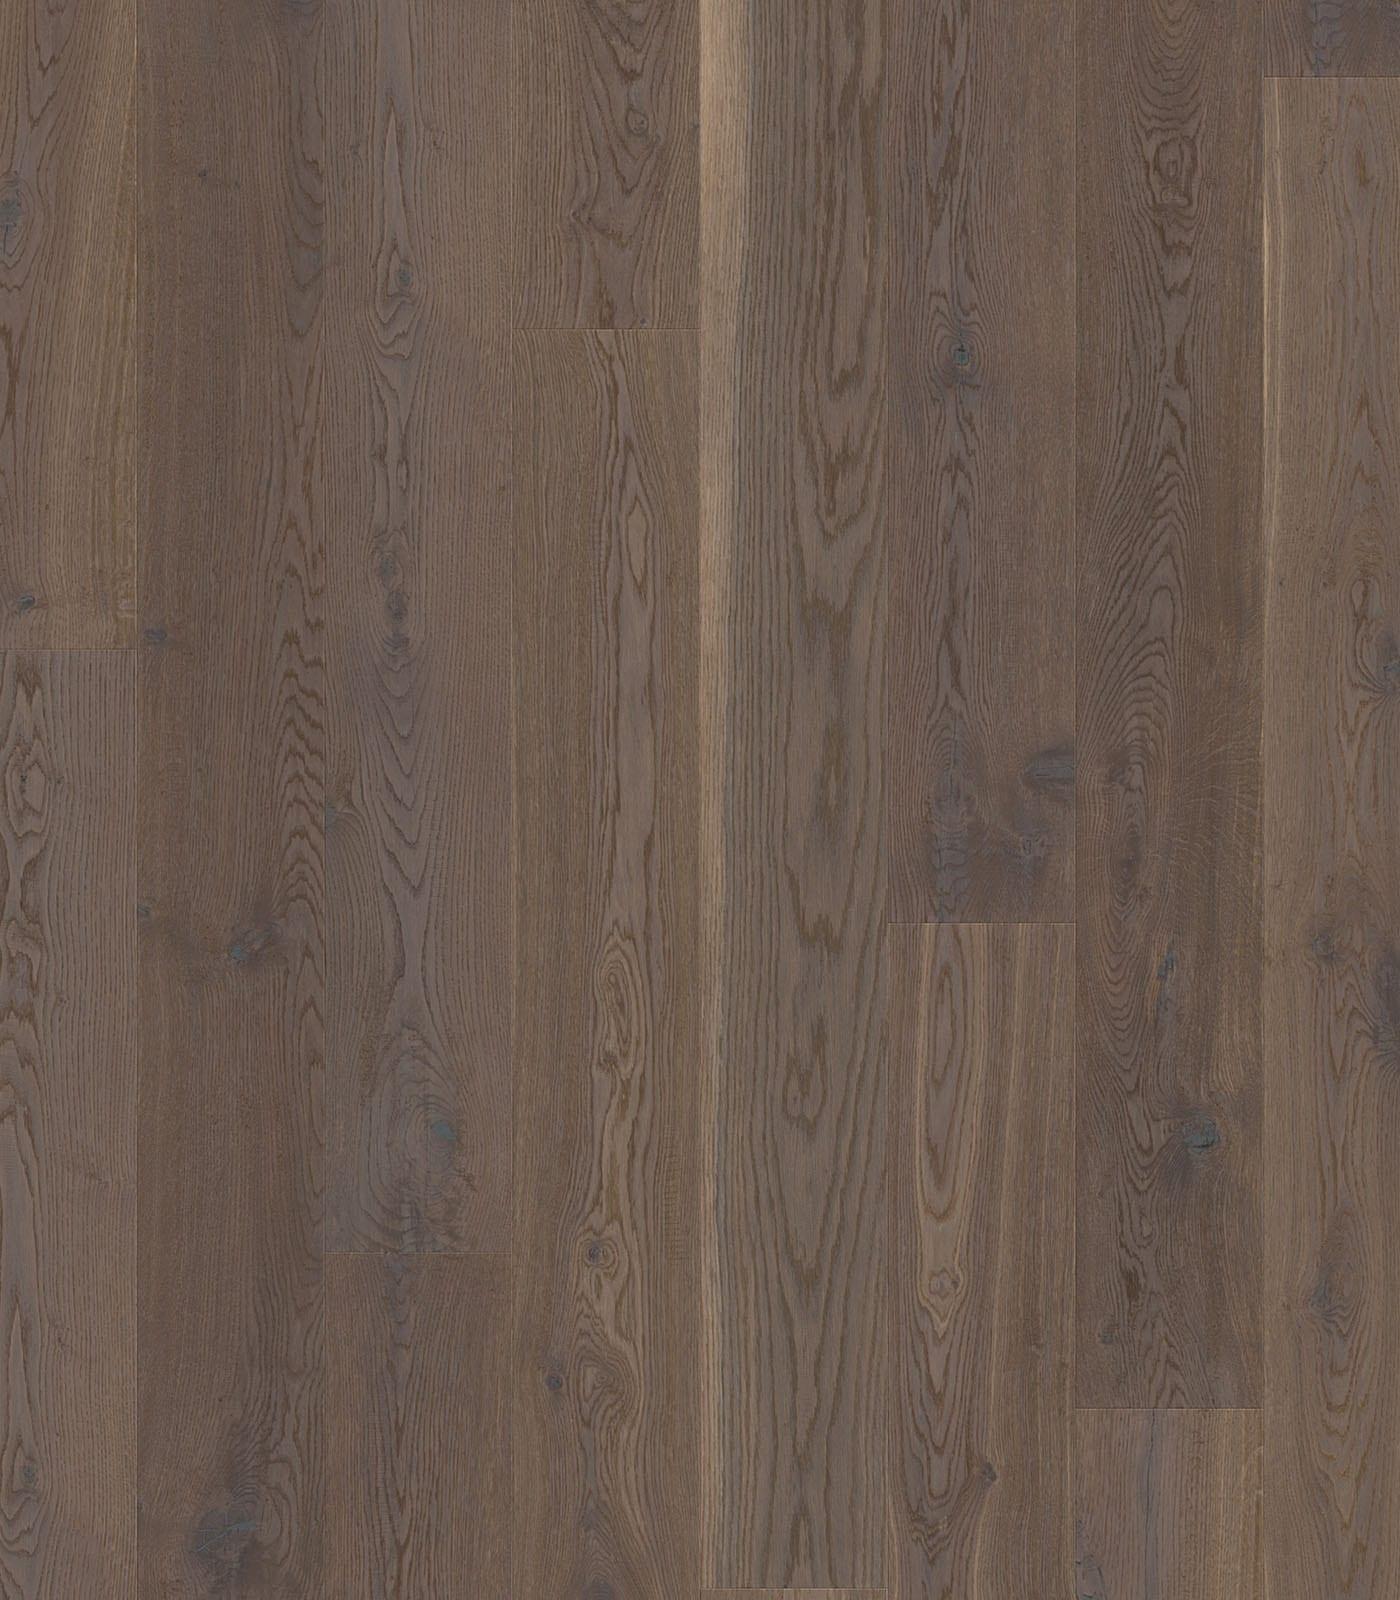 German Grey-Floors European Oak-Antique Collection